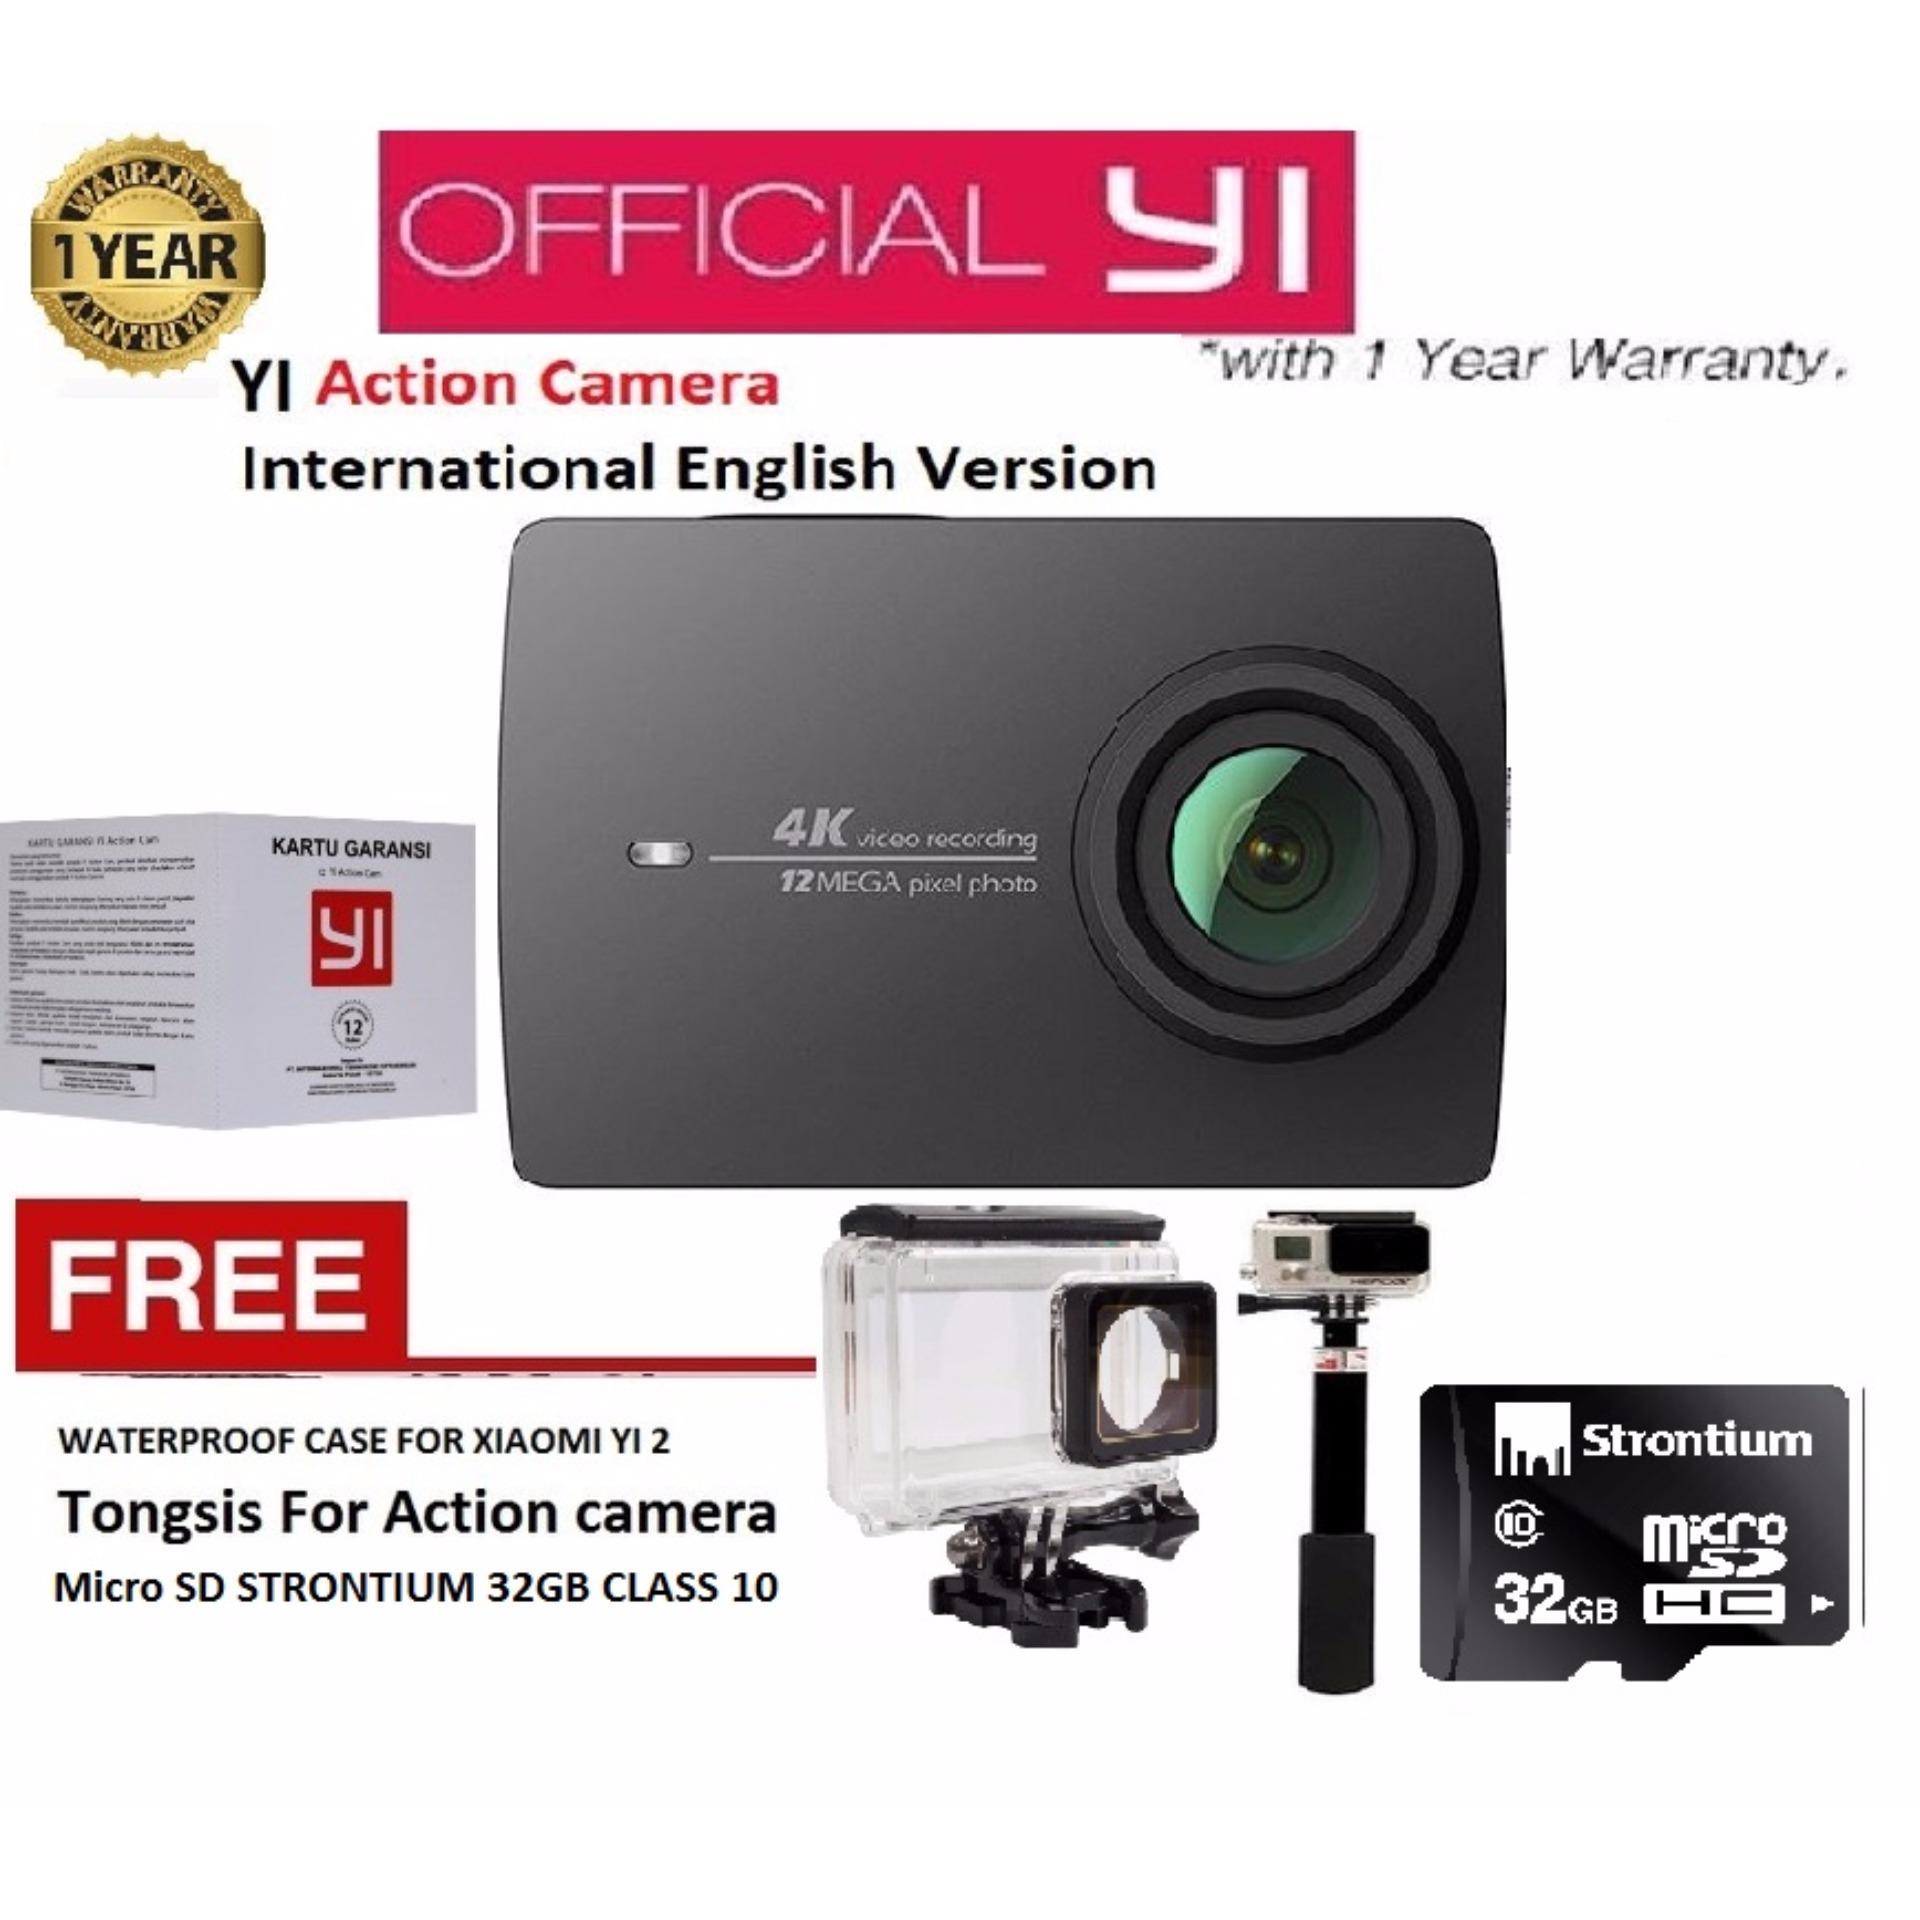 ... Xiaomi Yi 2nd Gen Action Camera With 4k - Hitam - International Version + Gratis Tongsis ...